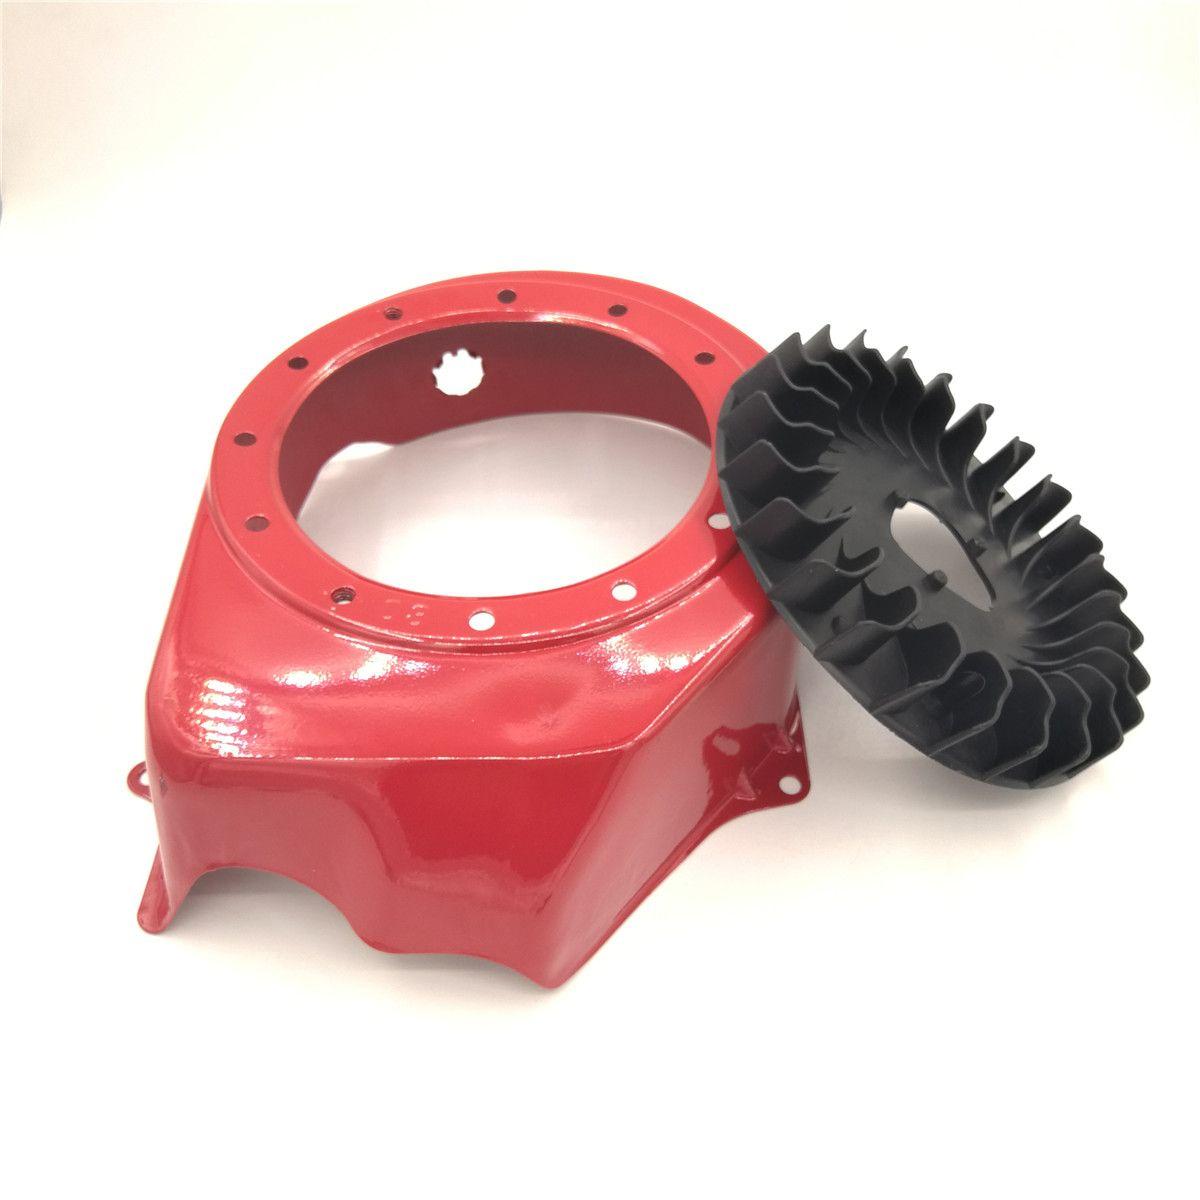 2018 recoil cooling flywheel fan housing cover shroud for honda rh dhgate com Honda GX160 Carburetor Parts Diagram Honda GX160 Carburetor Parts Diagram